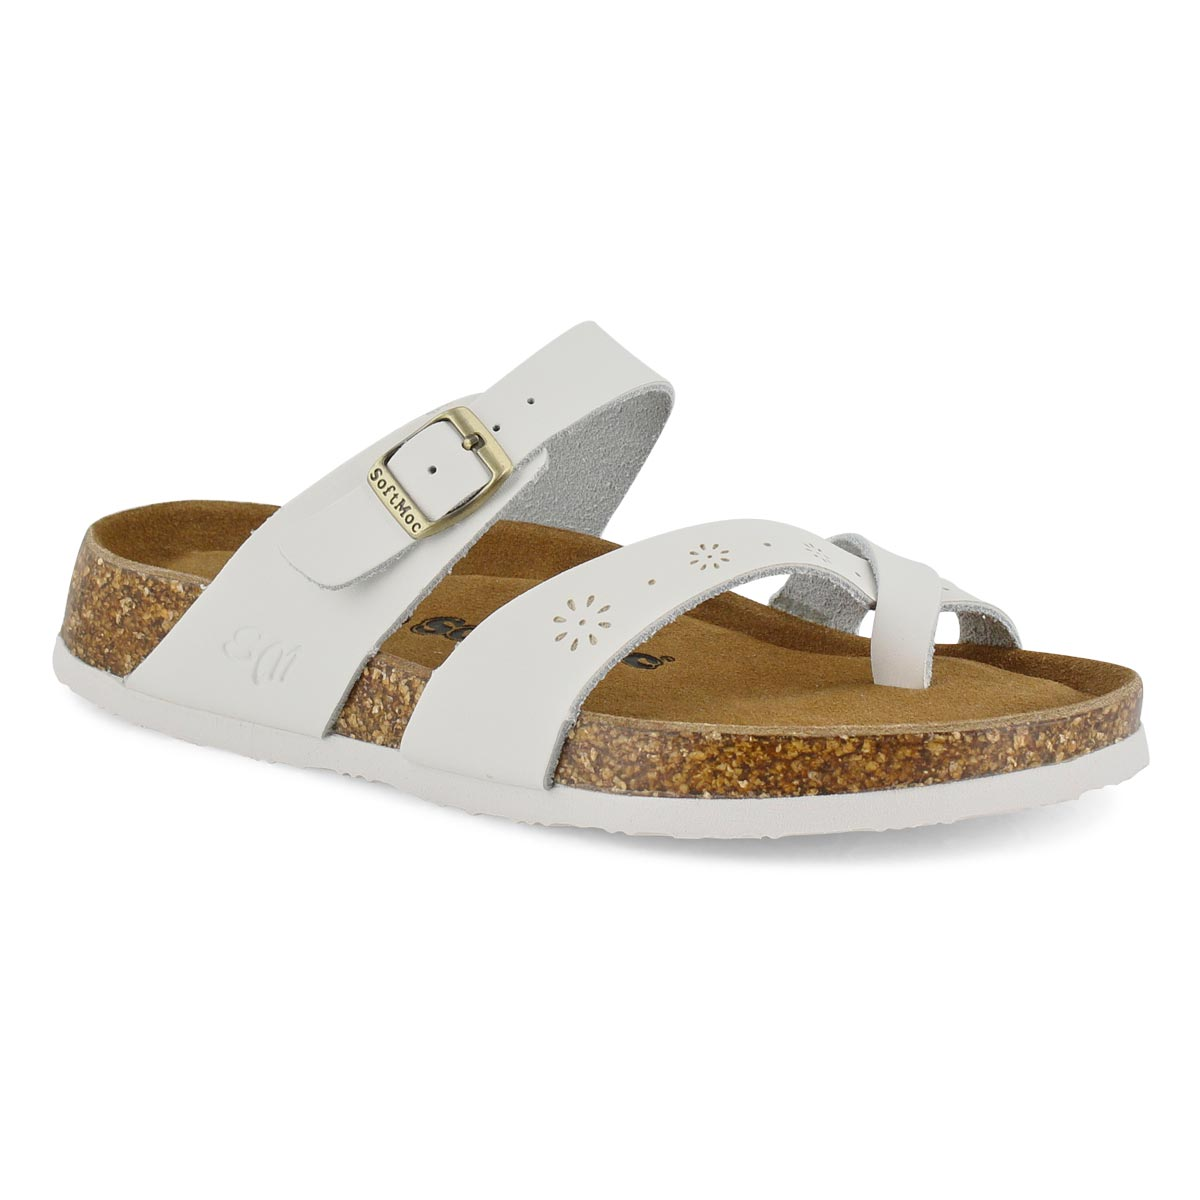 Lds Alicia 5 wht perf mem foam sandal